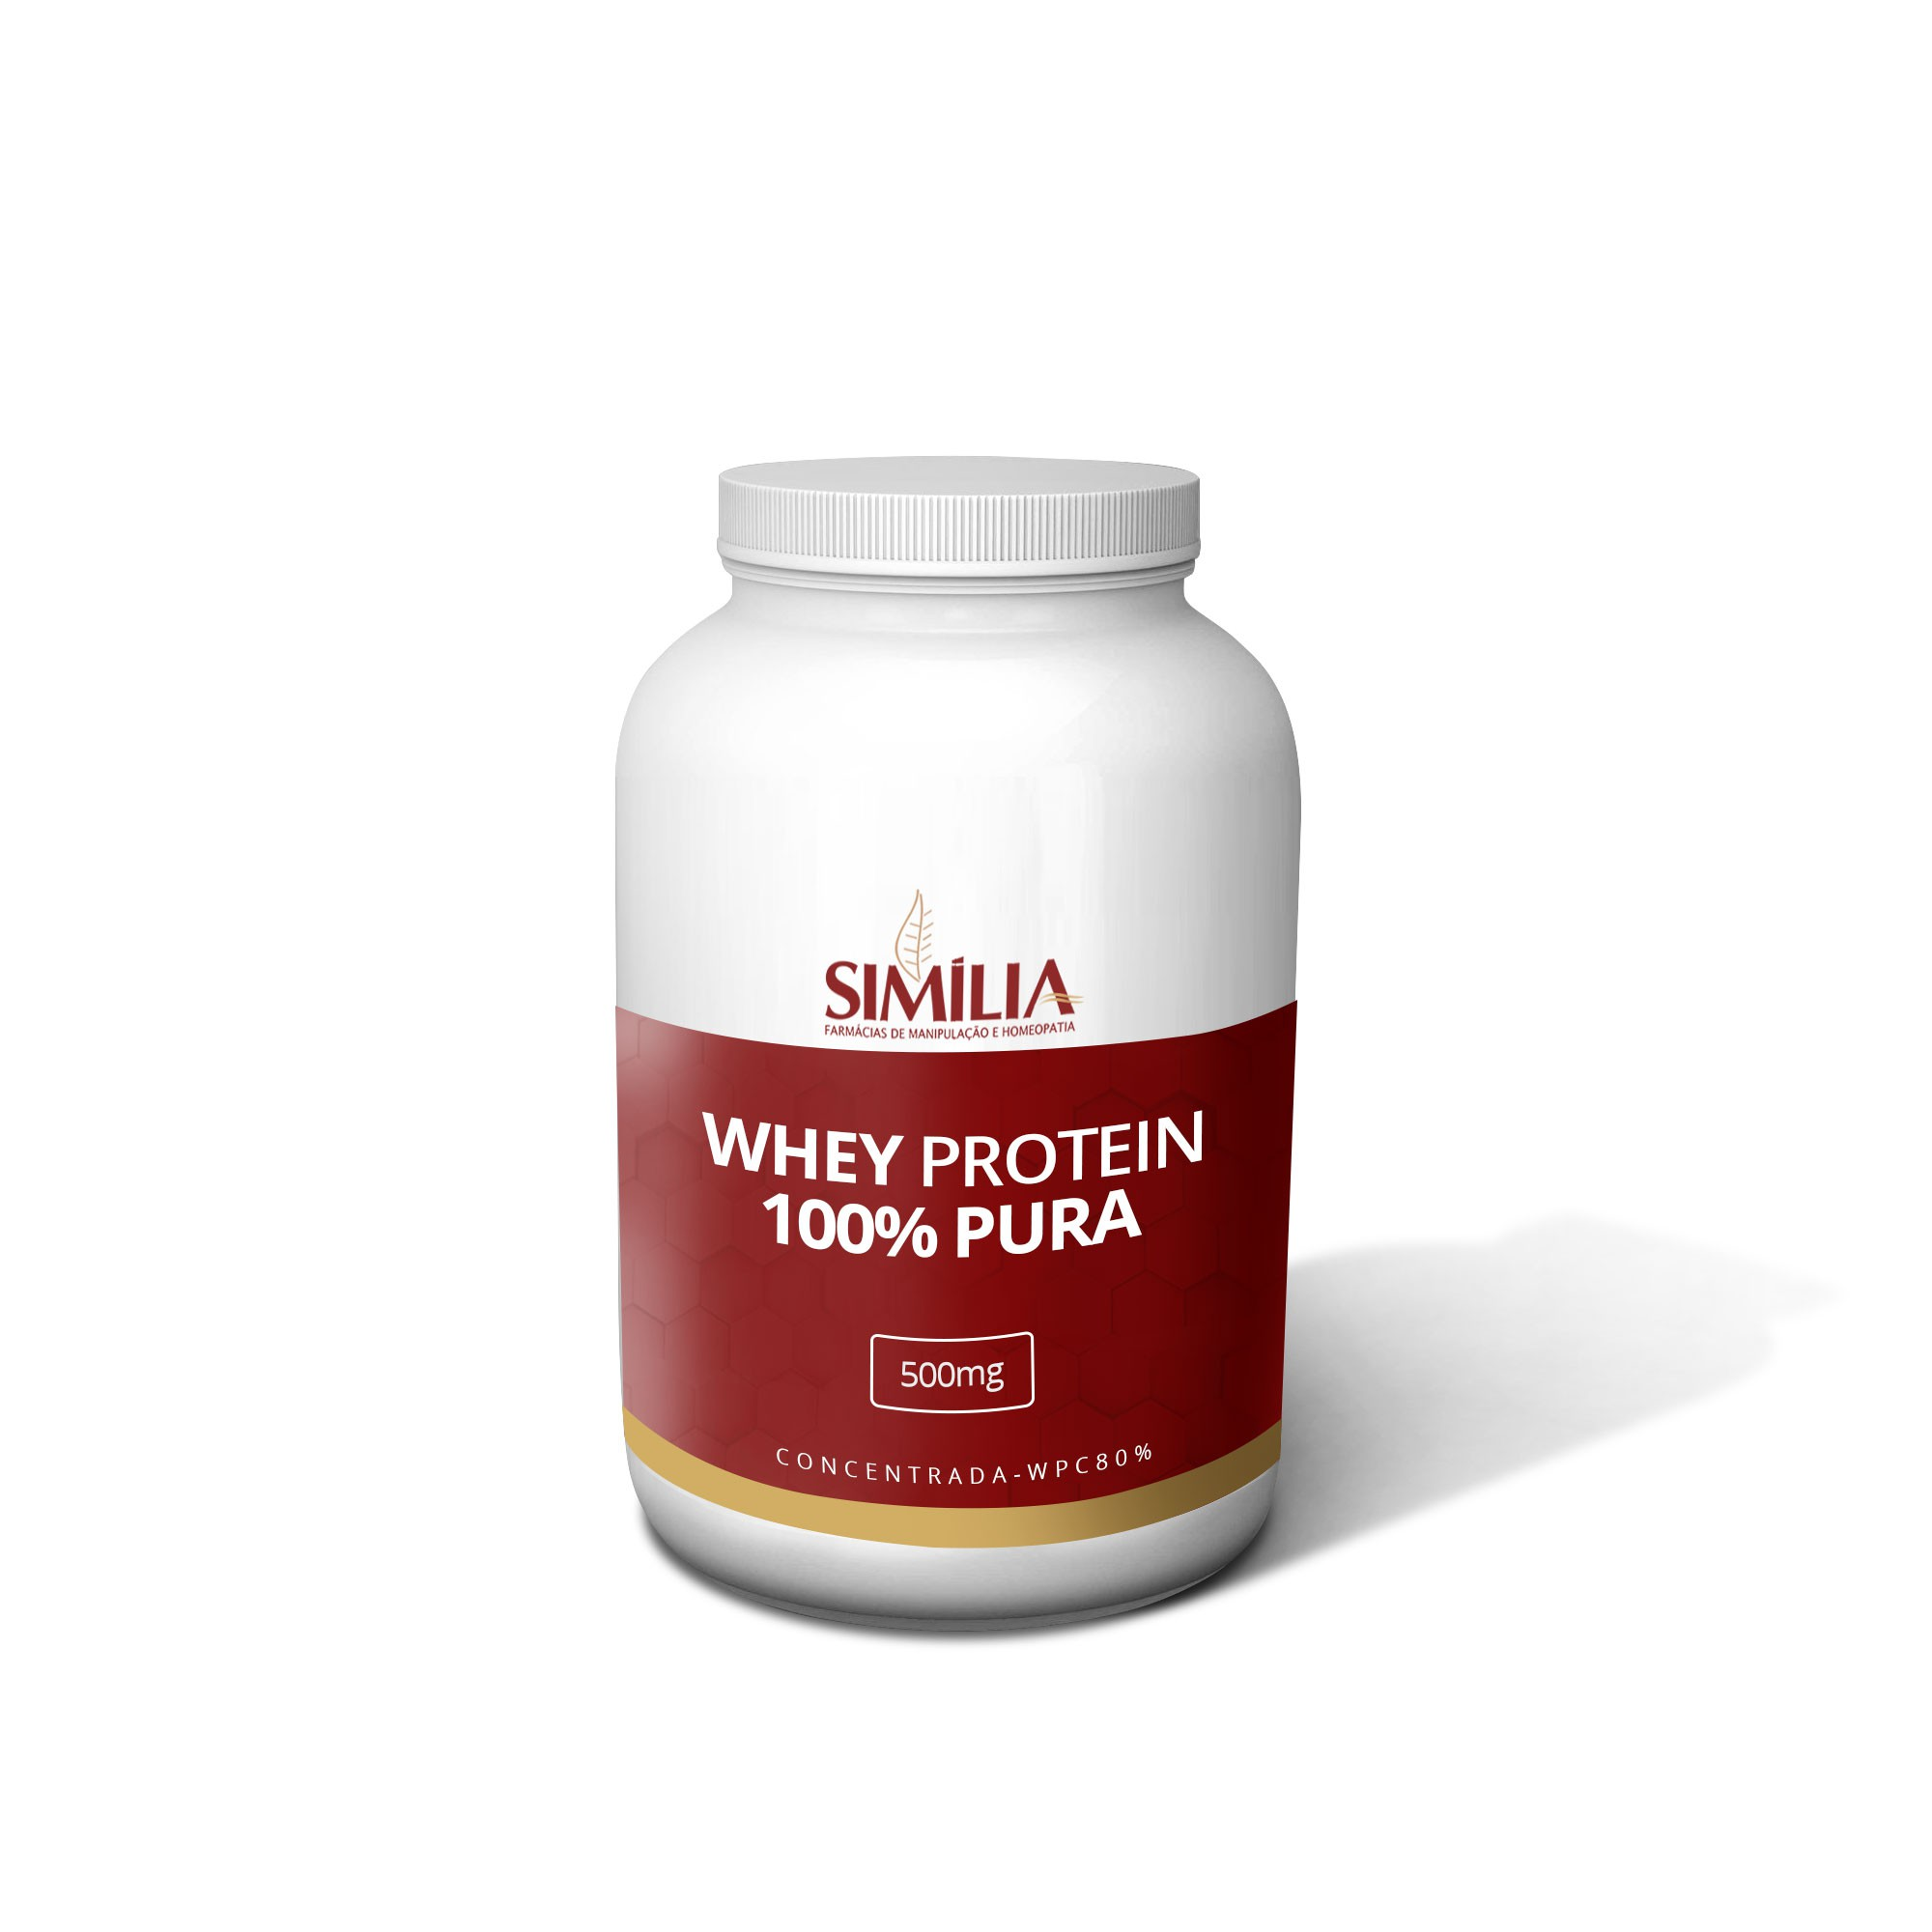 Whey Protein Concentrada Pura 500g